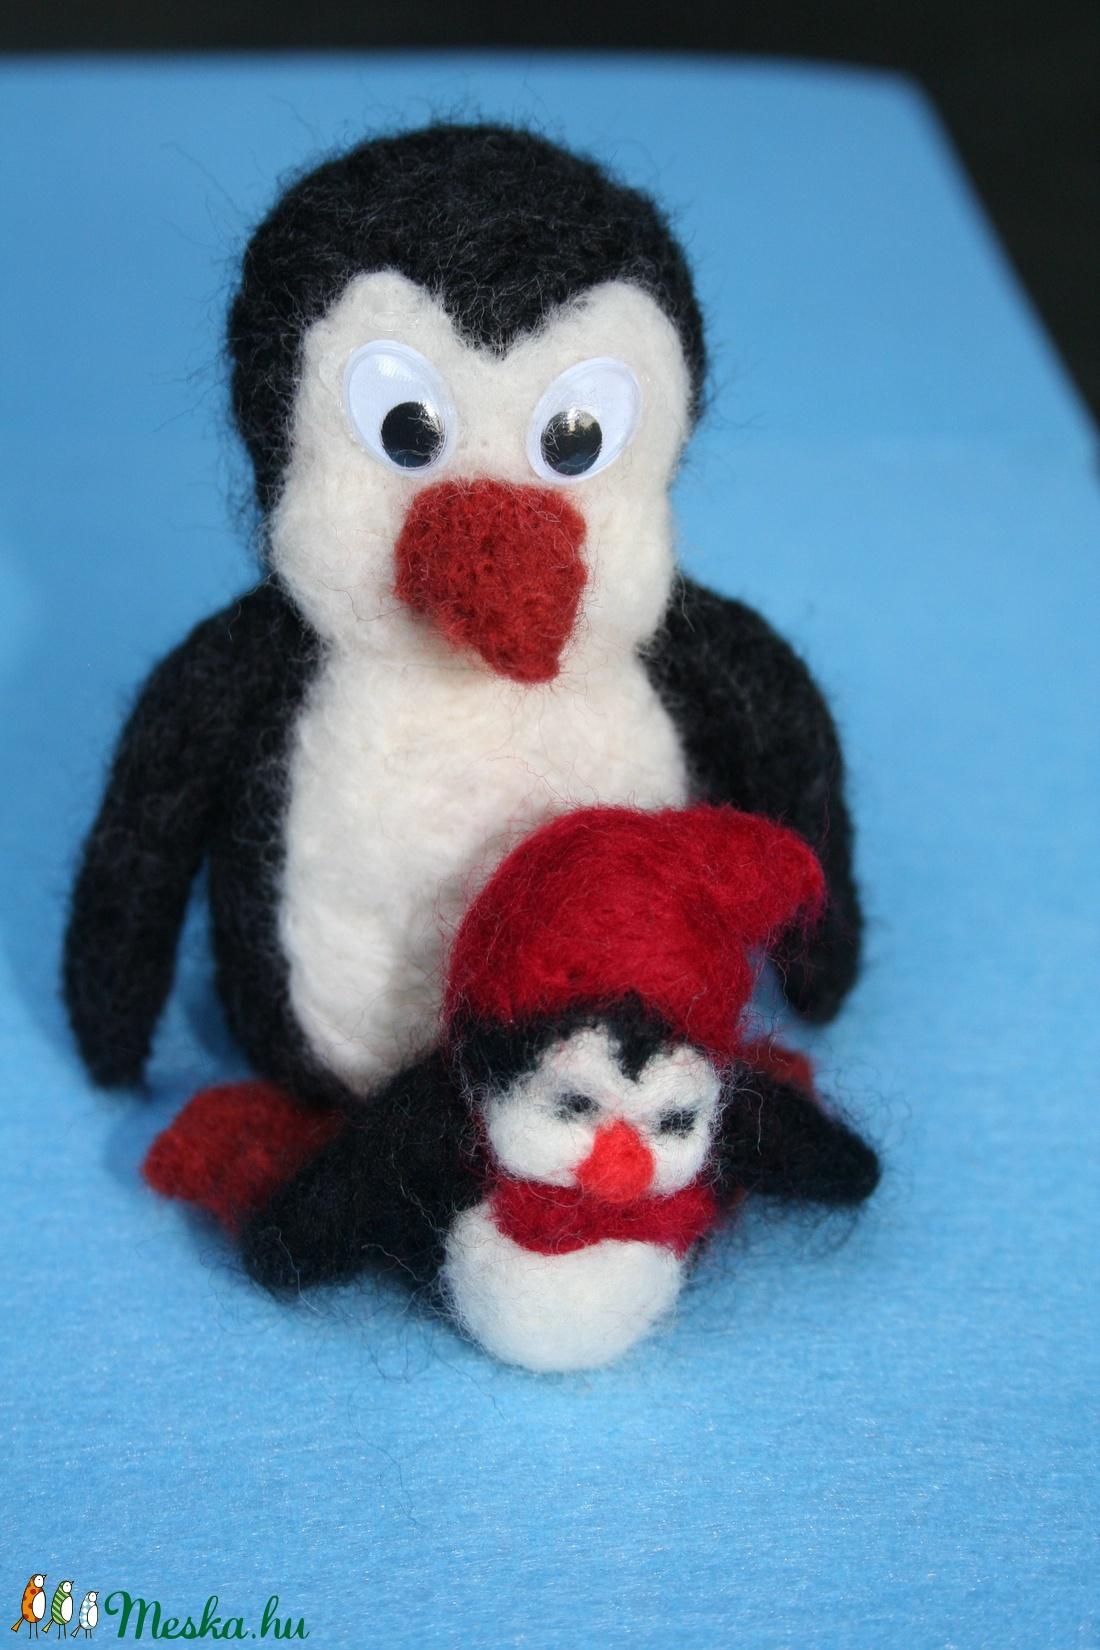 Pingu és Pingi  (Malnacskaworkroom) - Meska.hu